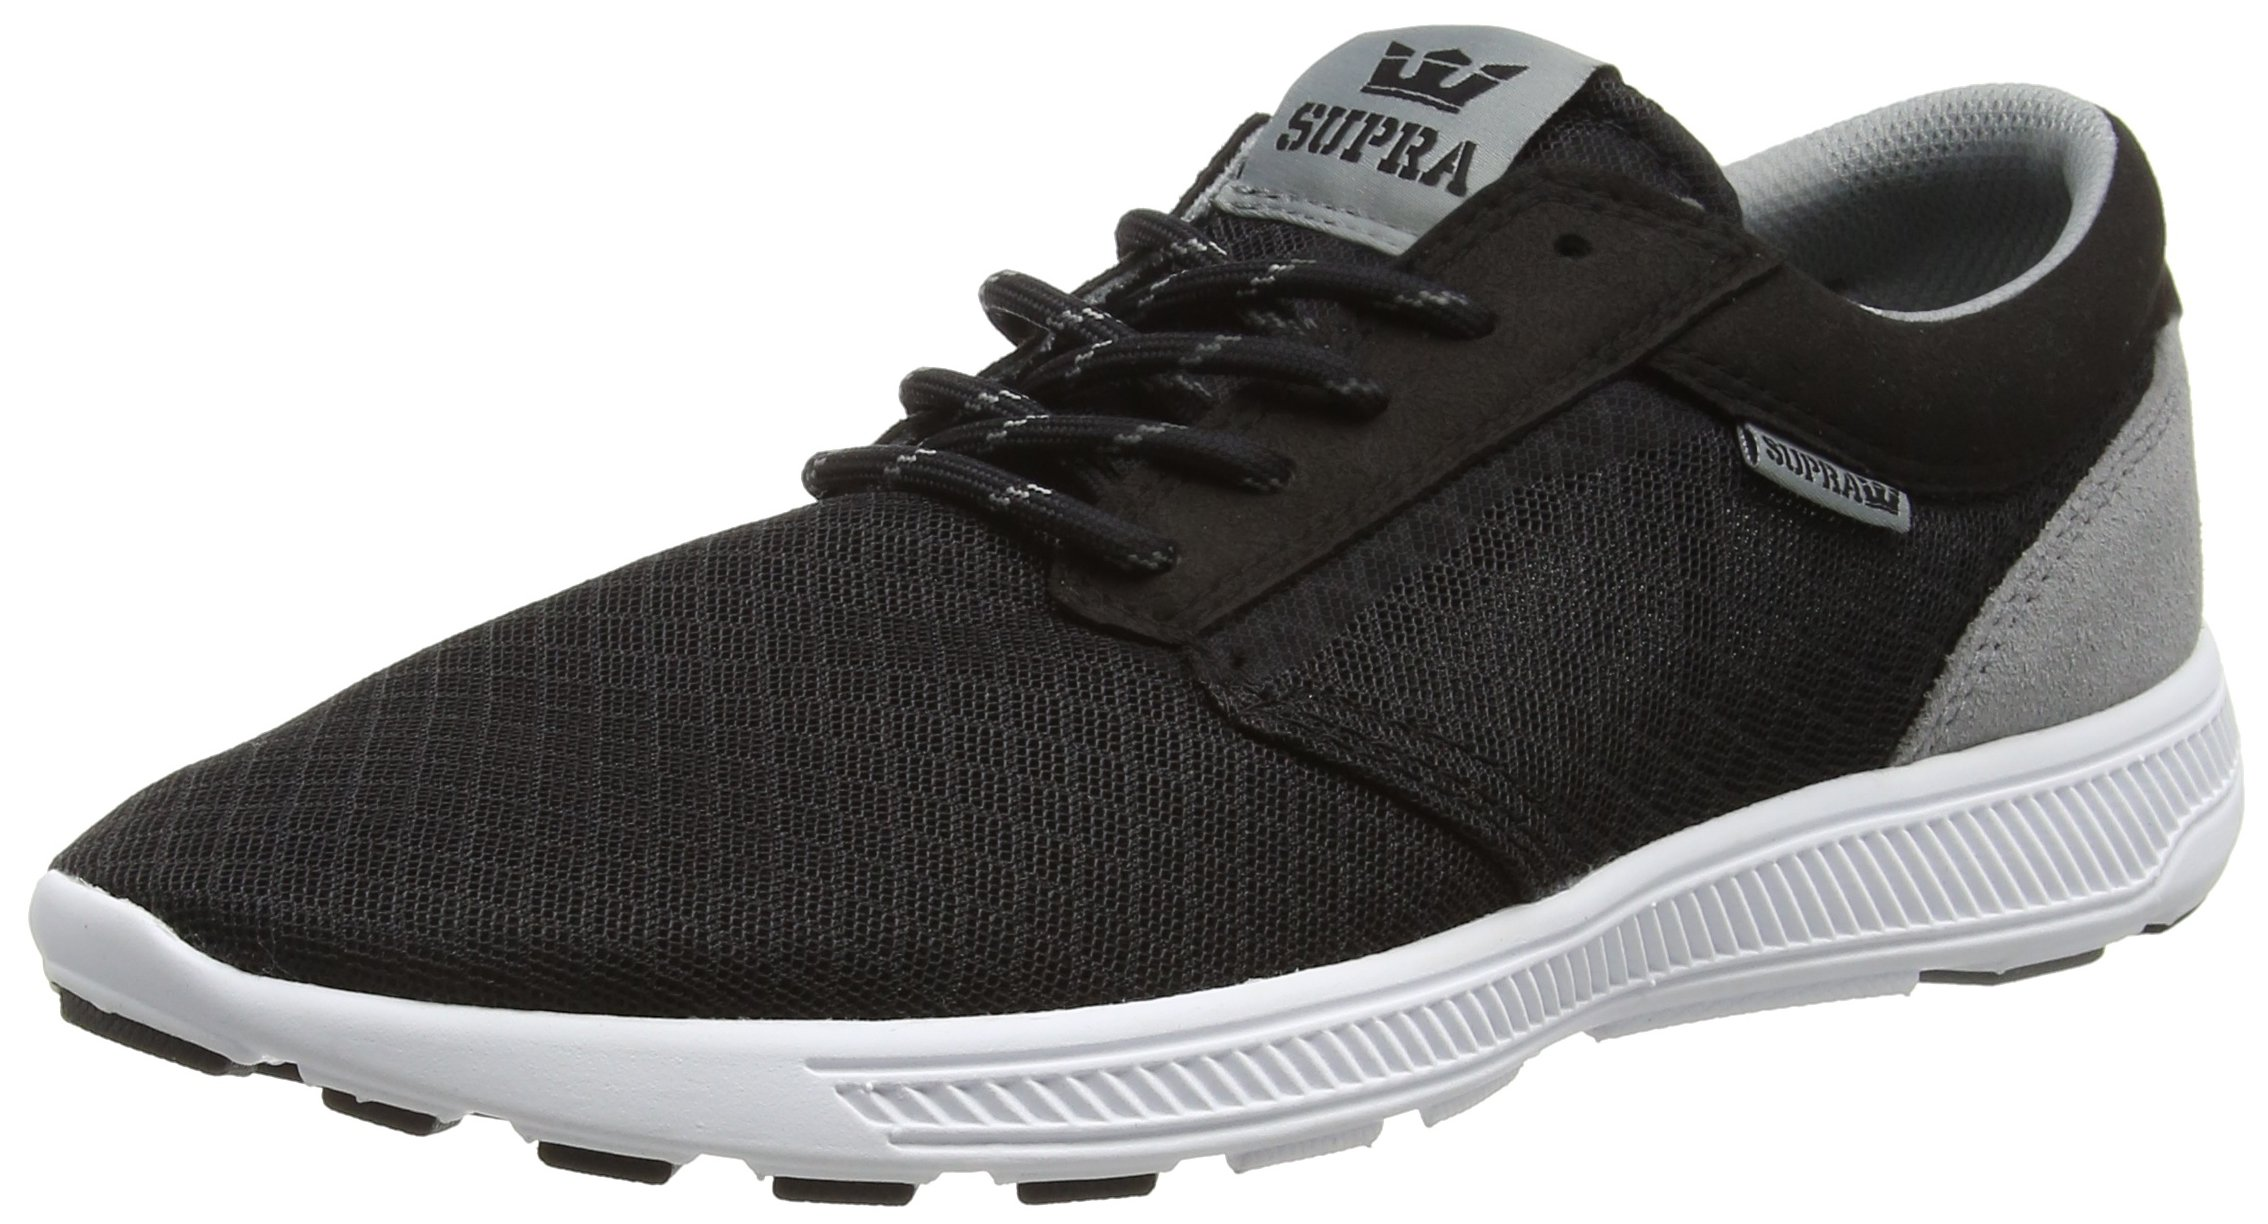 Supra Mixte Hammer RunSneakers AdulteNoirblackGreyWhite 5 Basses Bgr37 FKcTl1J3